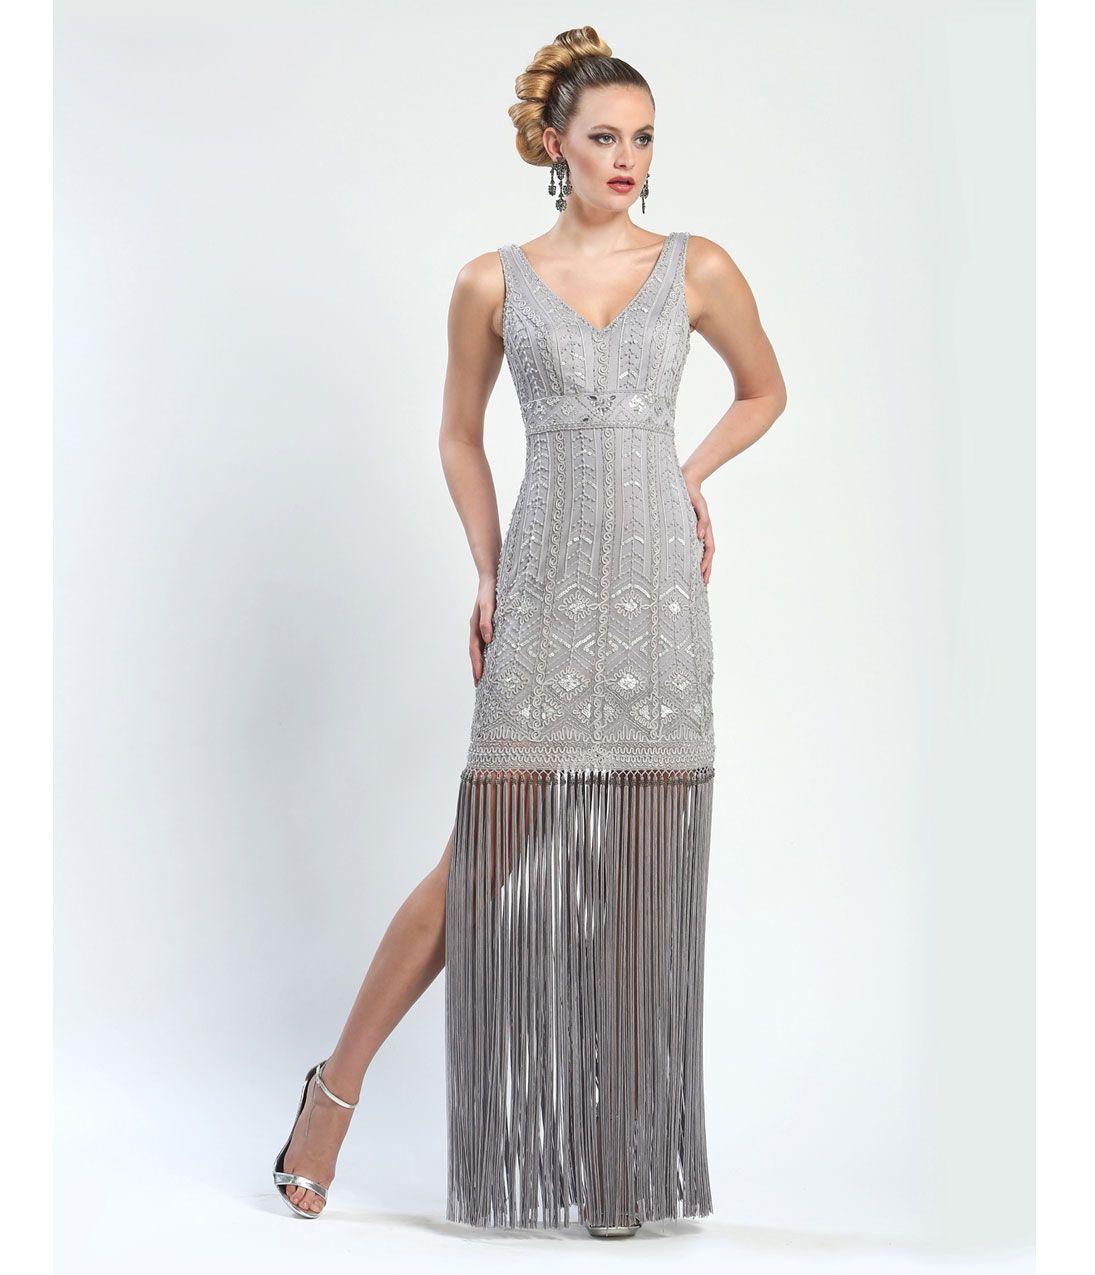 S formal dresses roaring sjazz age pinterest s